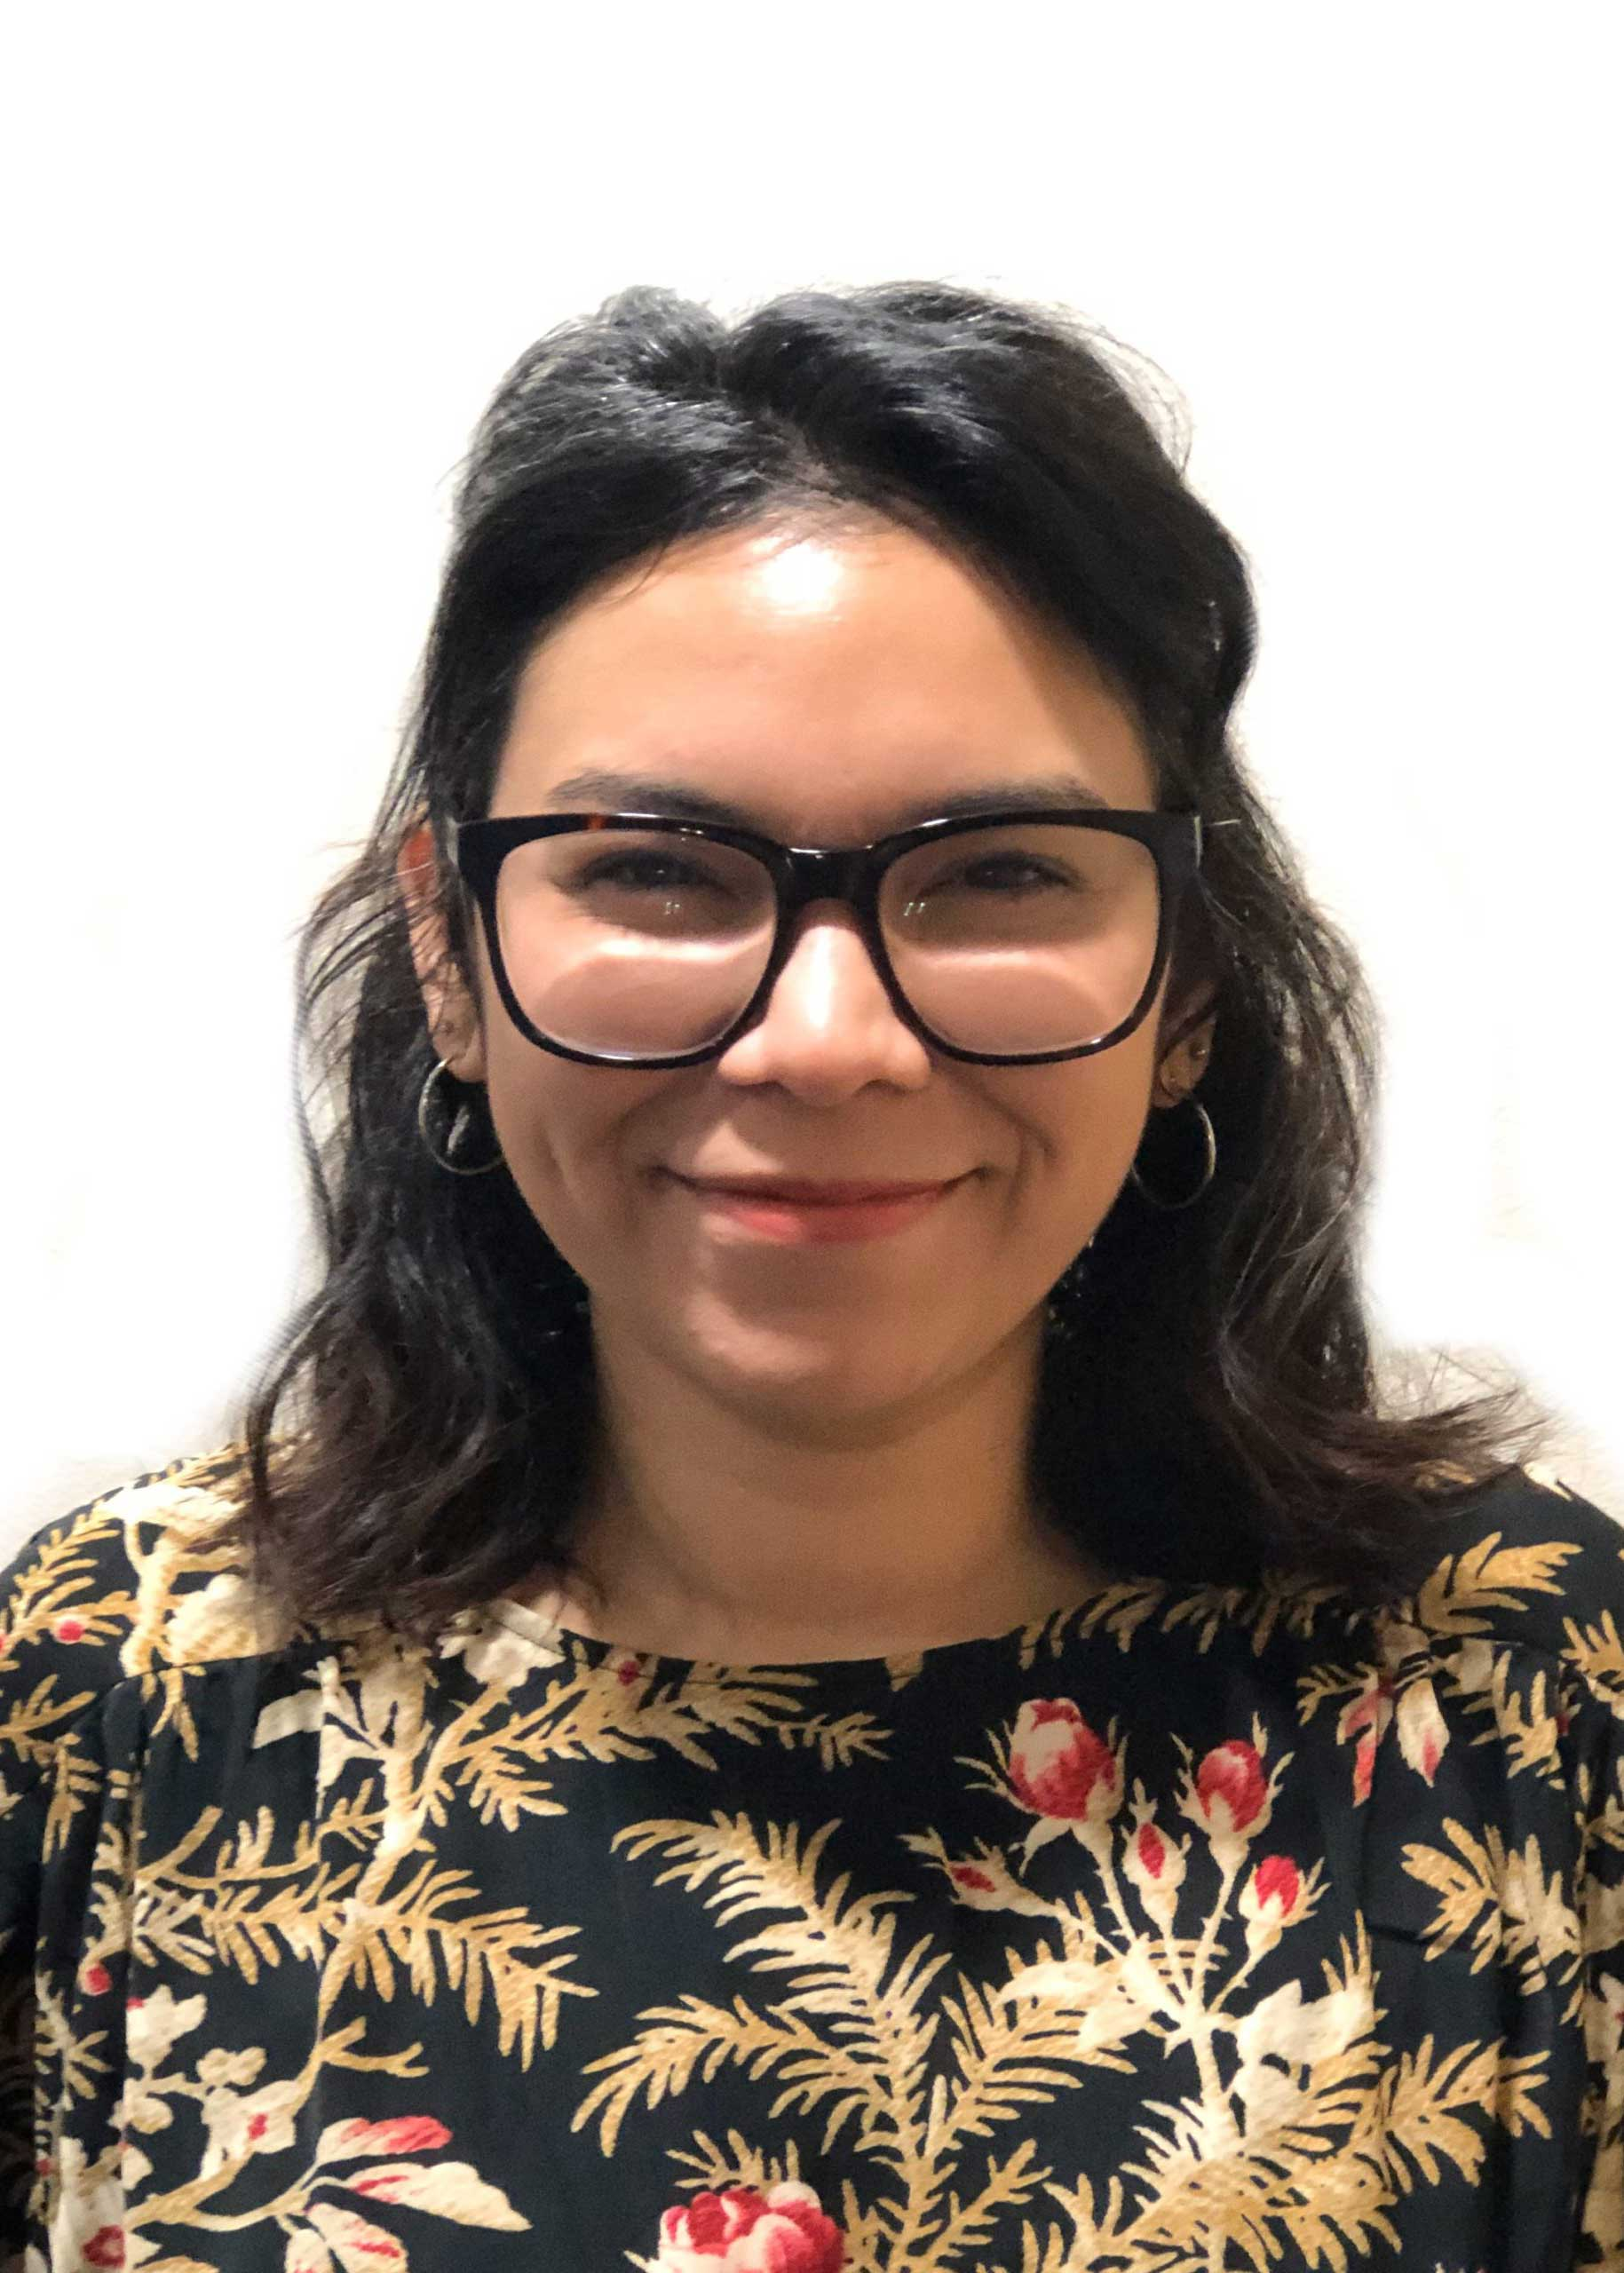 Lizette Maldonado